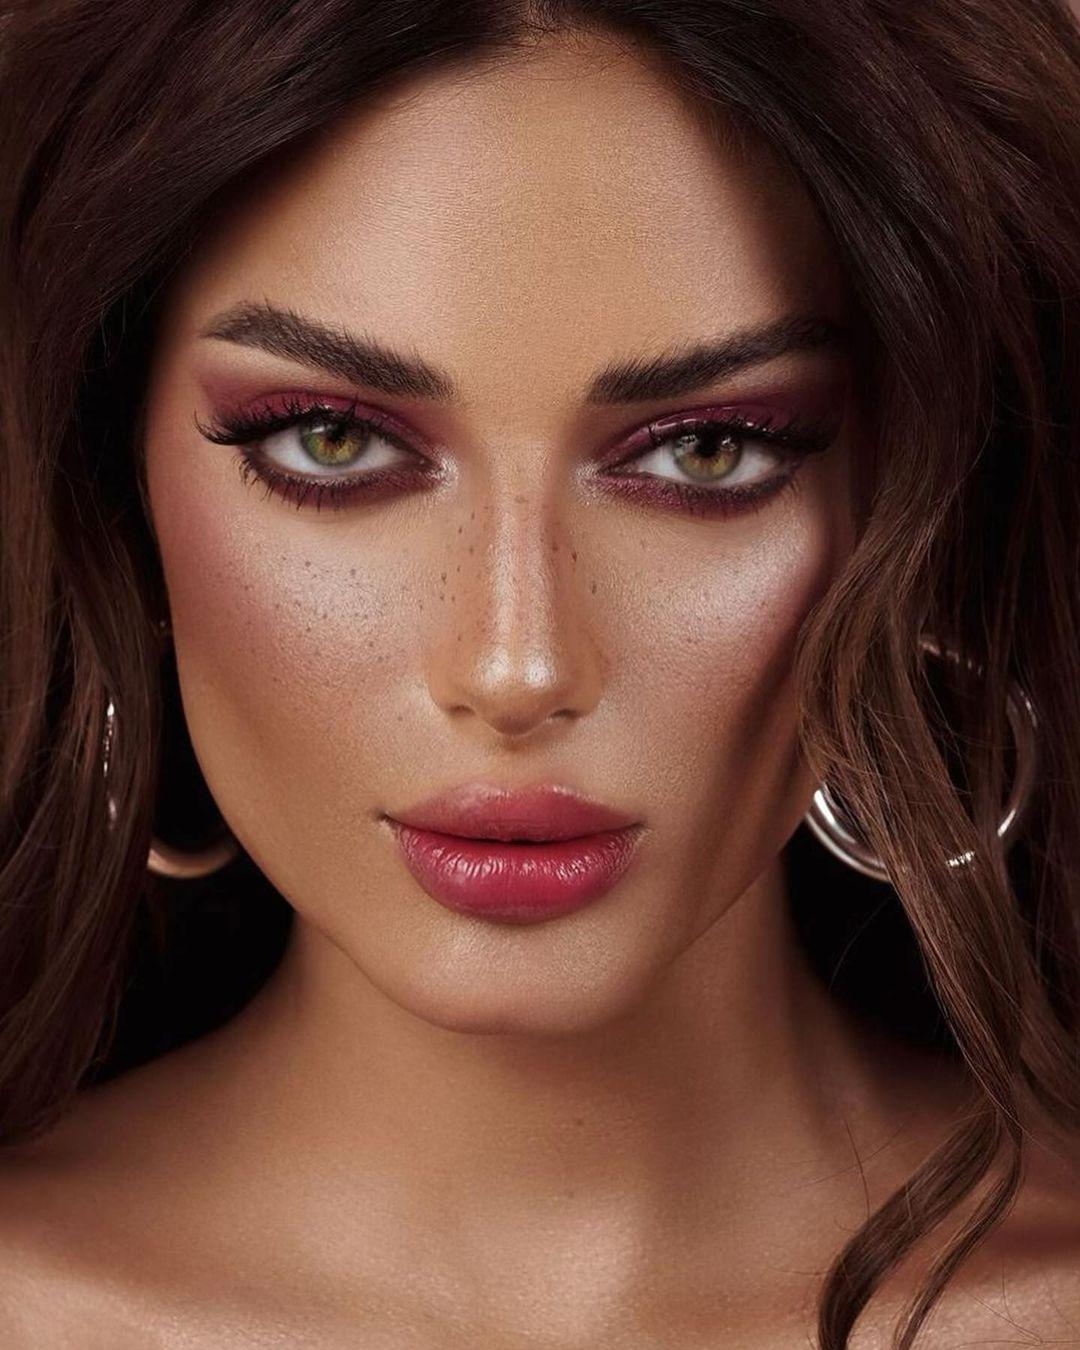 Hiba-Youssef-Wallpapers-Insta-Fit-Bio-6